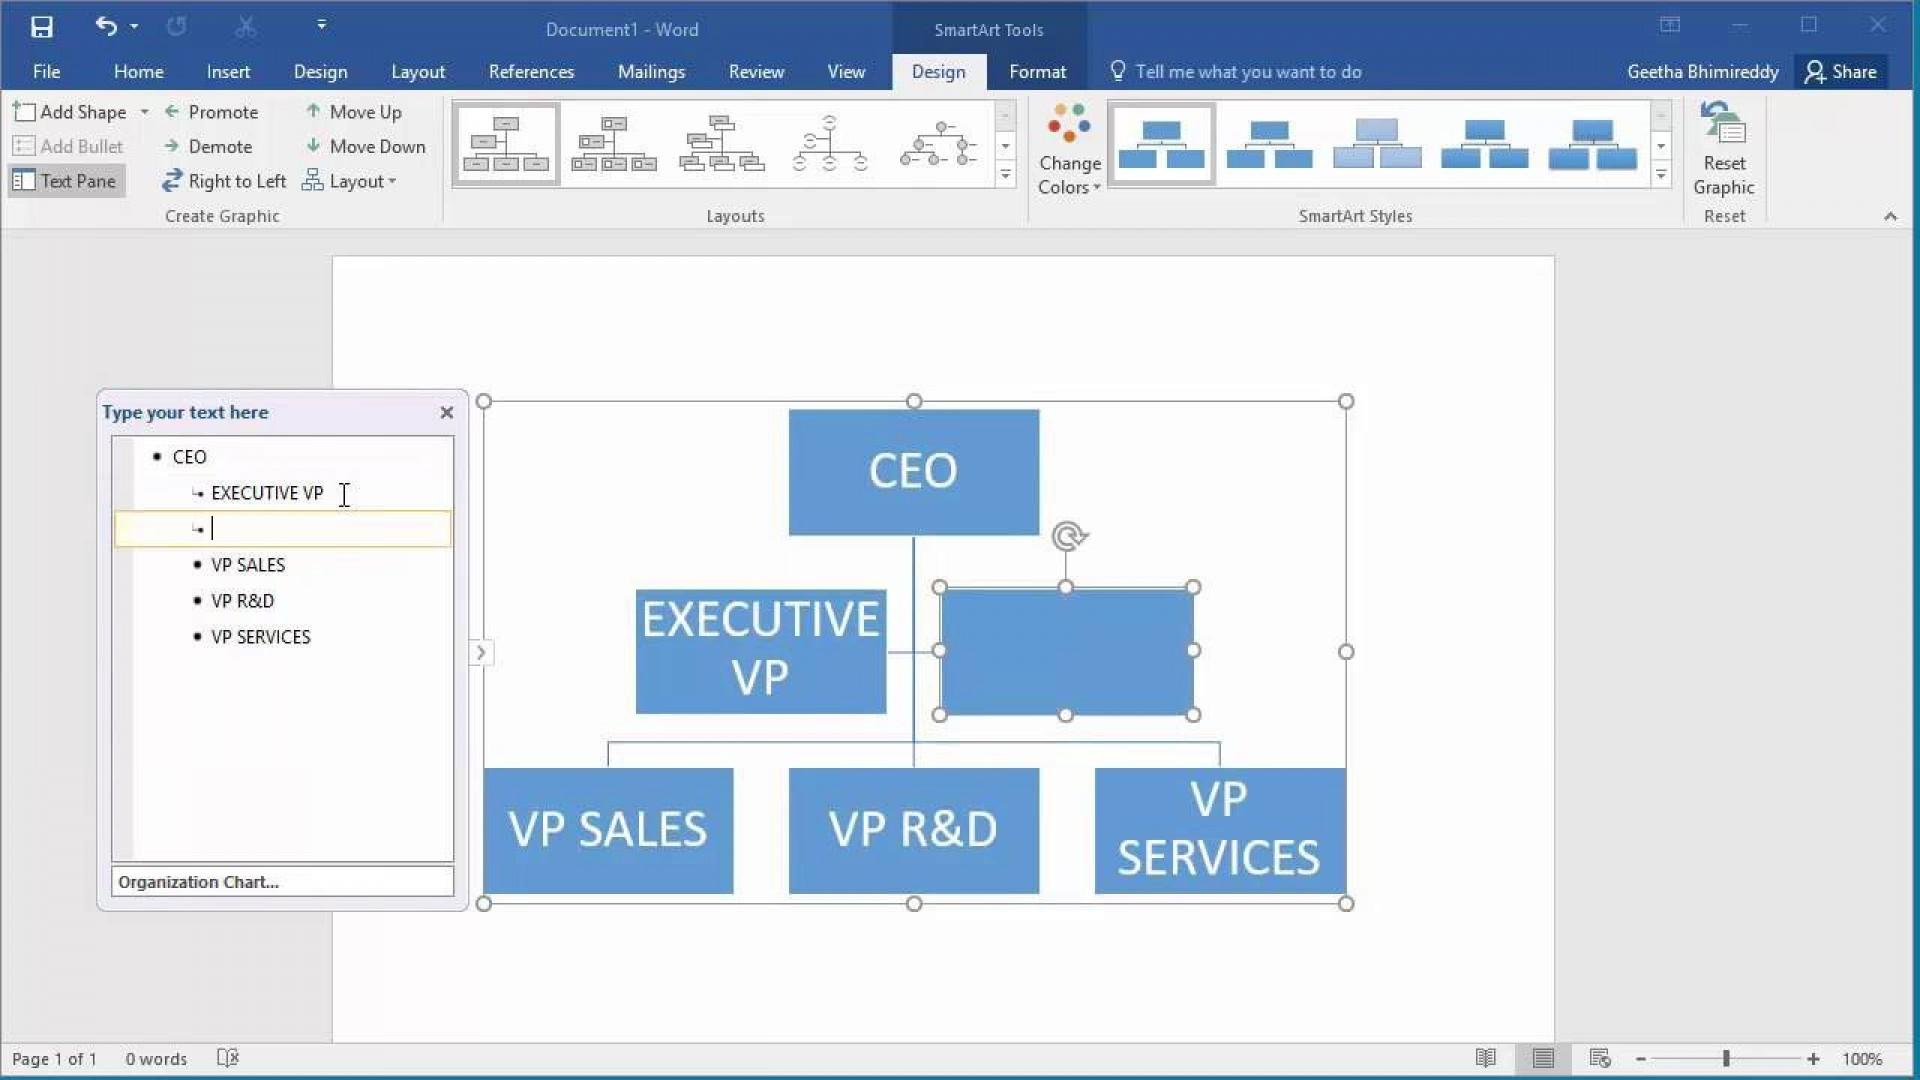 005 Impressive Microsoft Word Organization Chart Template Image  Organizational Download 20071920